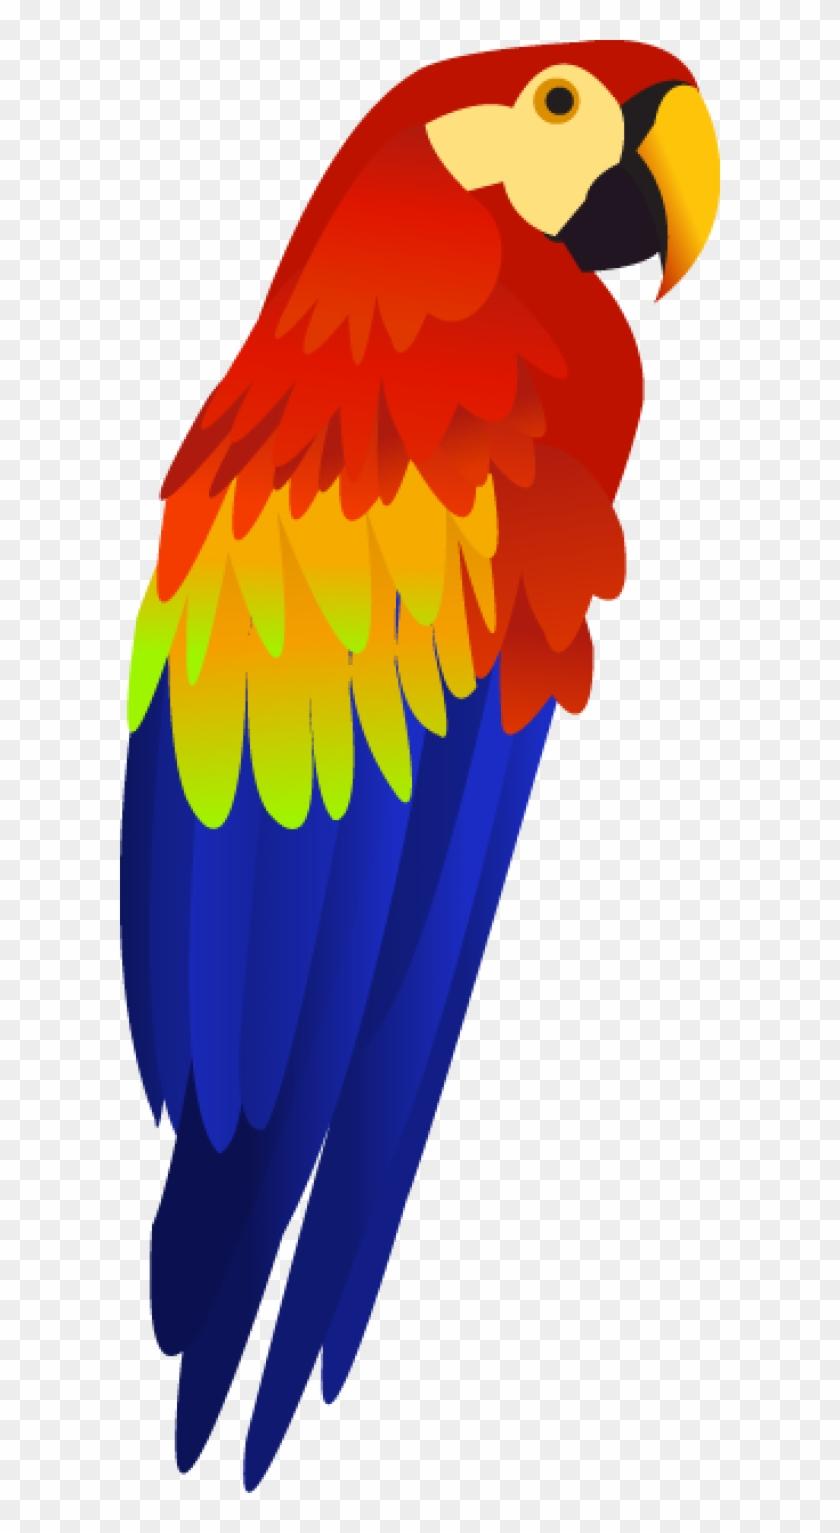 Paret clipart banner stock Parrot Png Free Download - Transparent Background Parrot Clipart ... banner stock